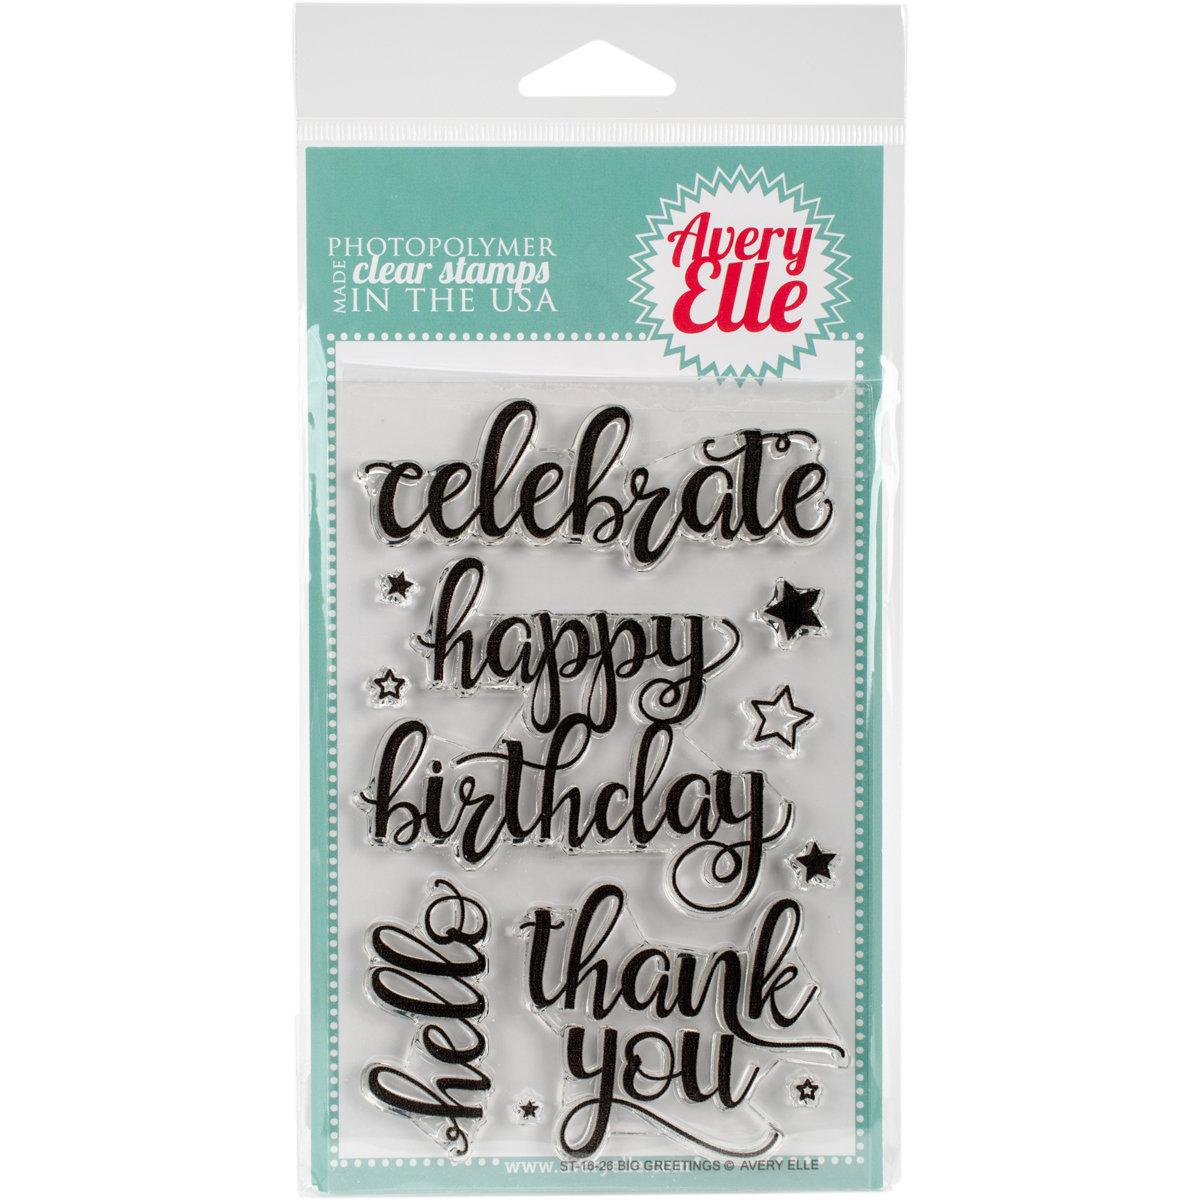 Avery Elle BIG GREETINGS Clear Stamp Set